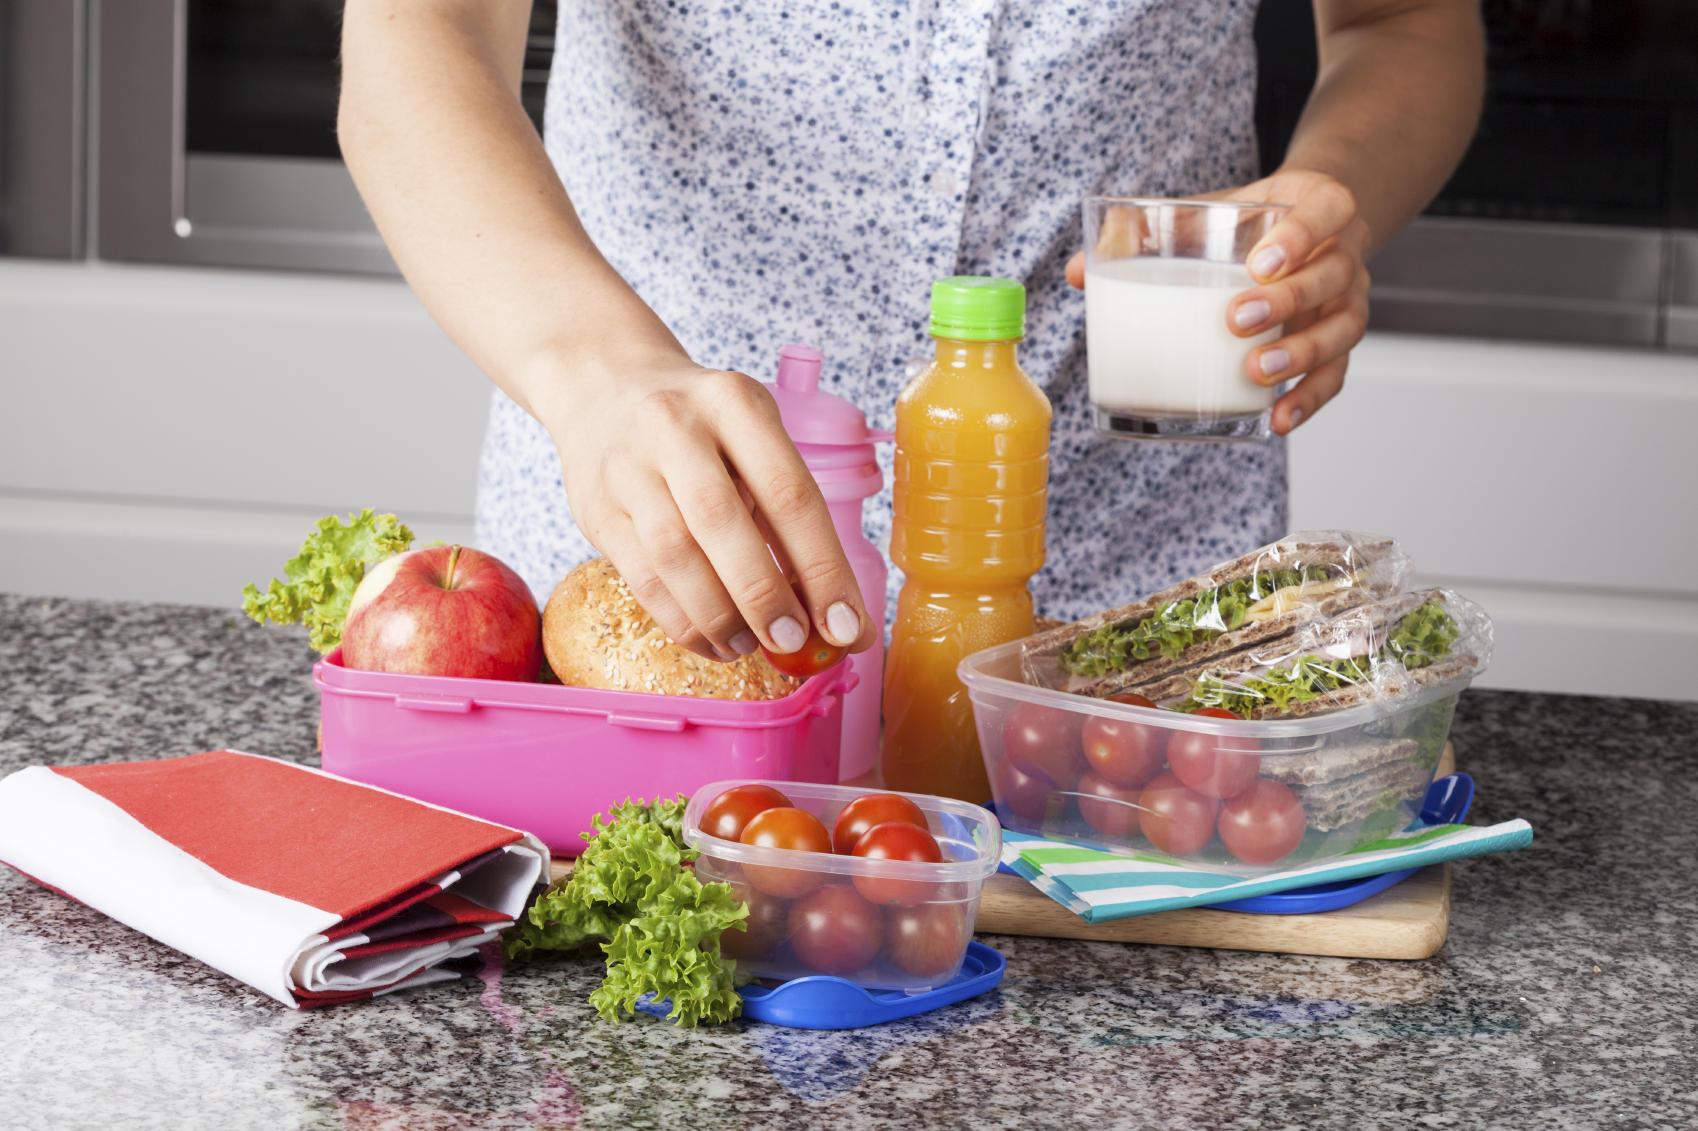 Mother preparing lunch box